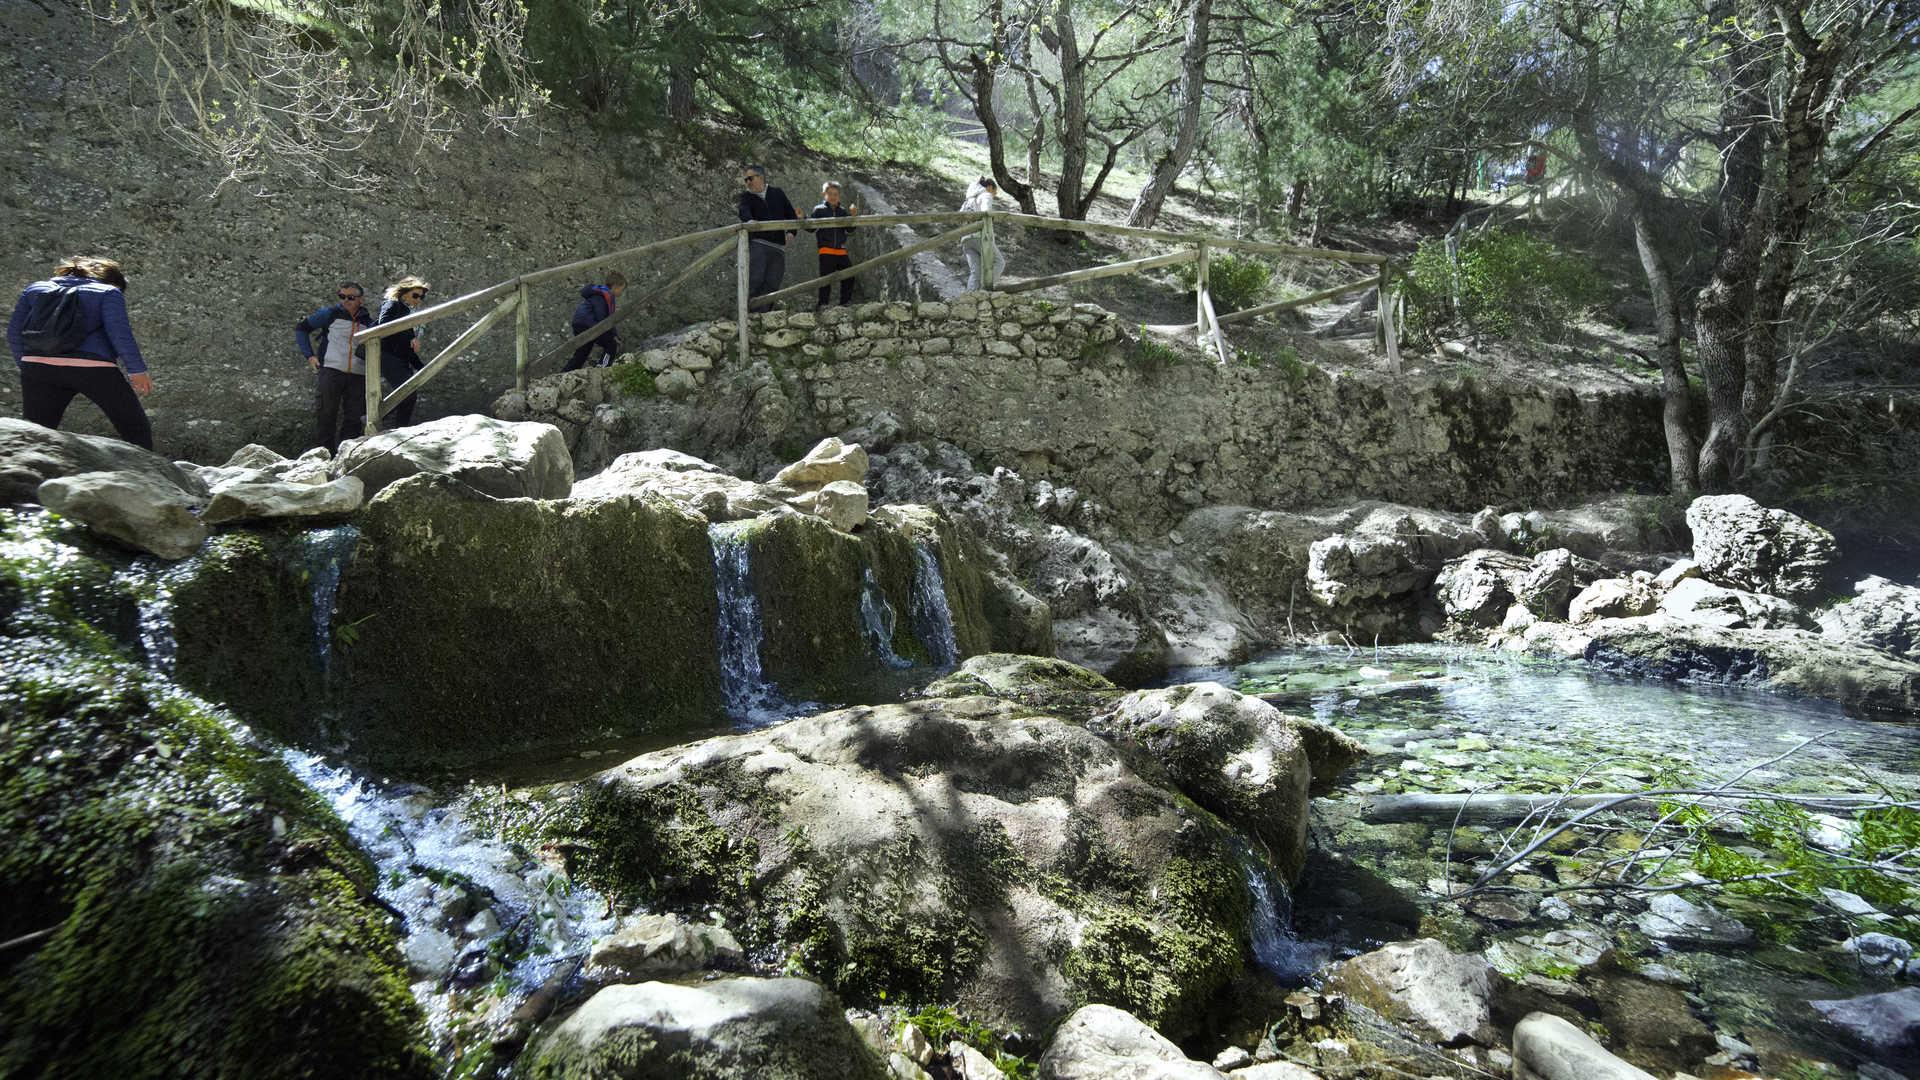 https://multimedia.andalucia.org/media/5E2F1D757B7446FCA3CAC98E8D3BAAC7/img/7D9C9F5884D14B8F986FBEBF4A3A99B9/6-6_Nacimiento_del_Guadalquivir_Sierra_de_Cazorla_Jaen.jpg?responsive